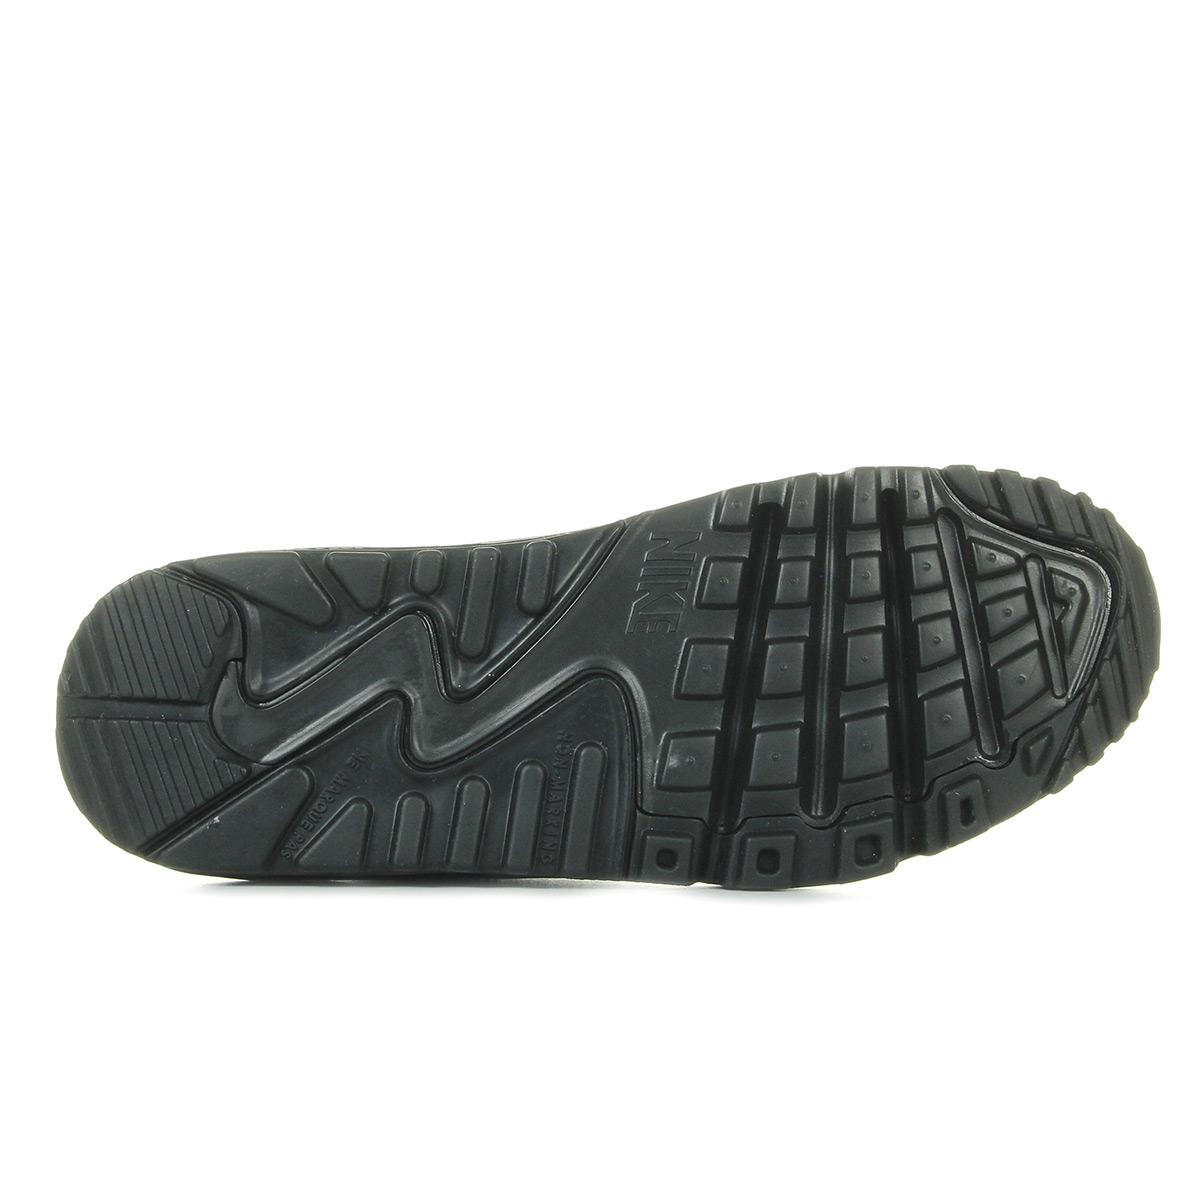 super popular 346fd 765d0 ... Nike Air Max 90 Mesh (GS) 833418001, Baskets mode